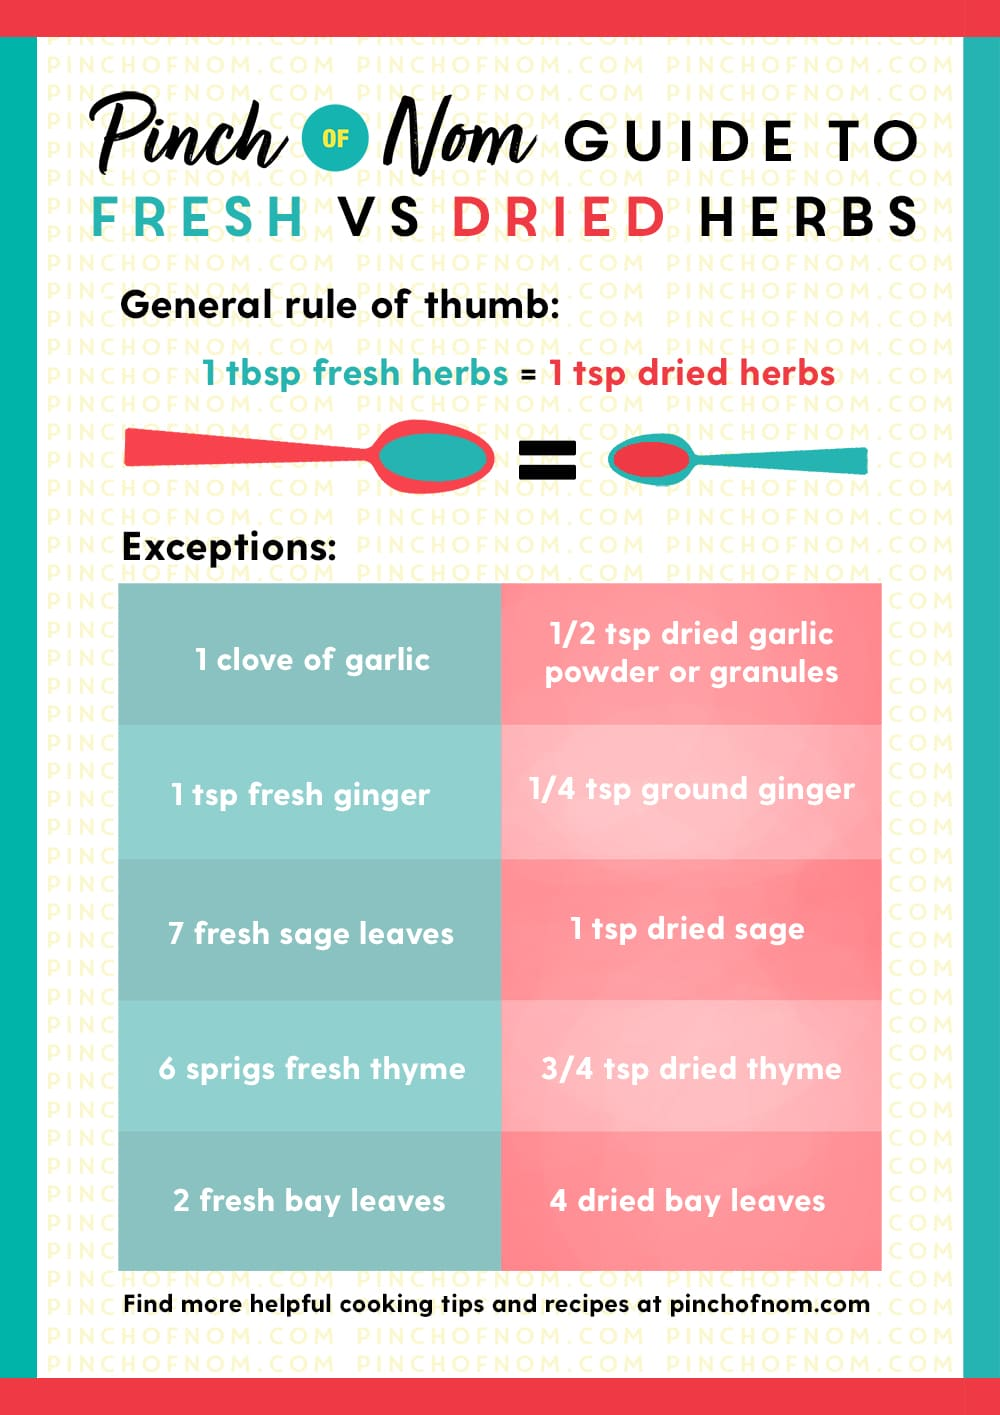 Fresh vs Dried Herbs | Pinch of Nom Slimming Recipes